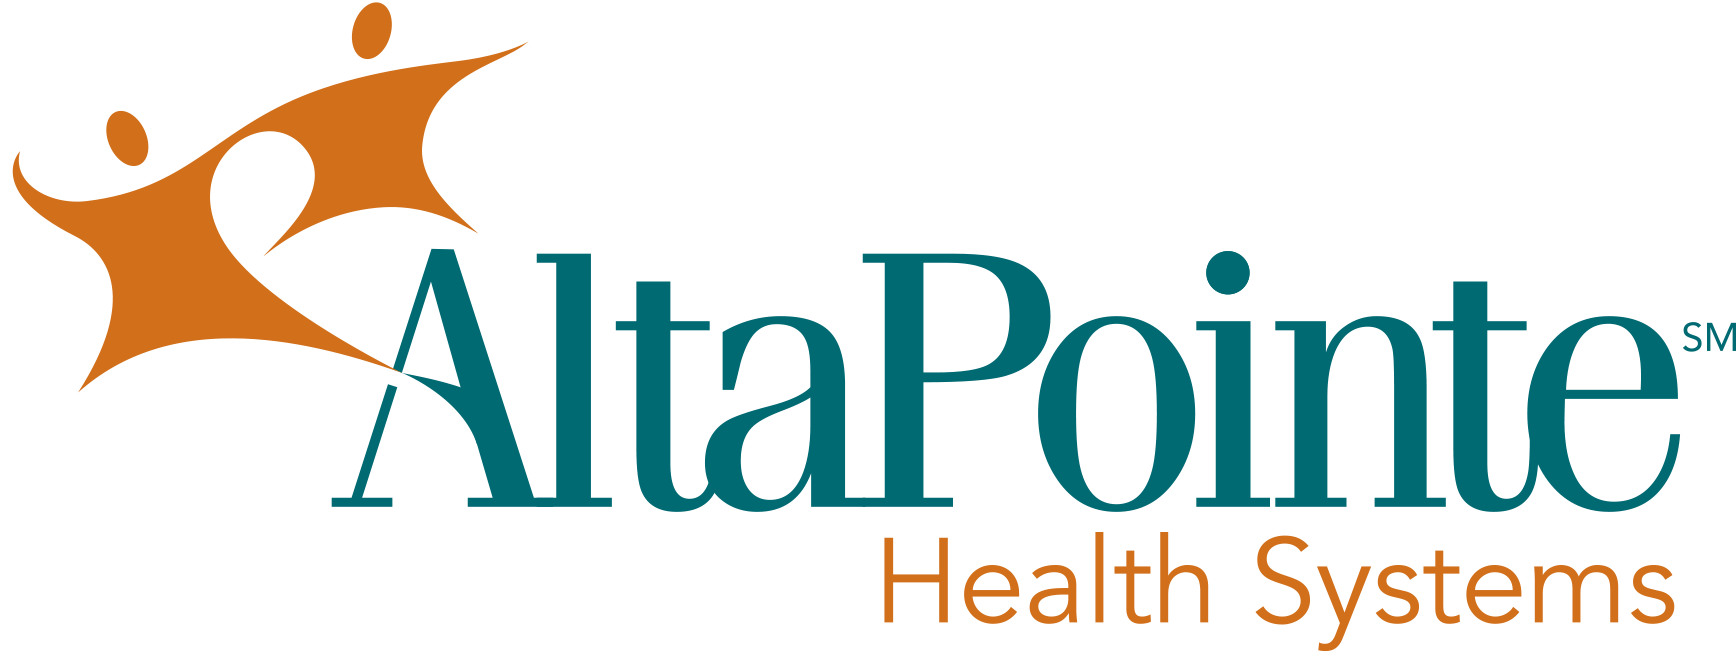 AltaPointe Logo